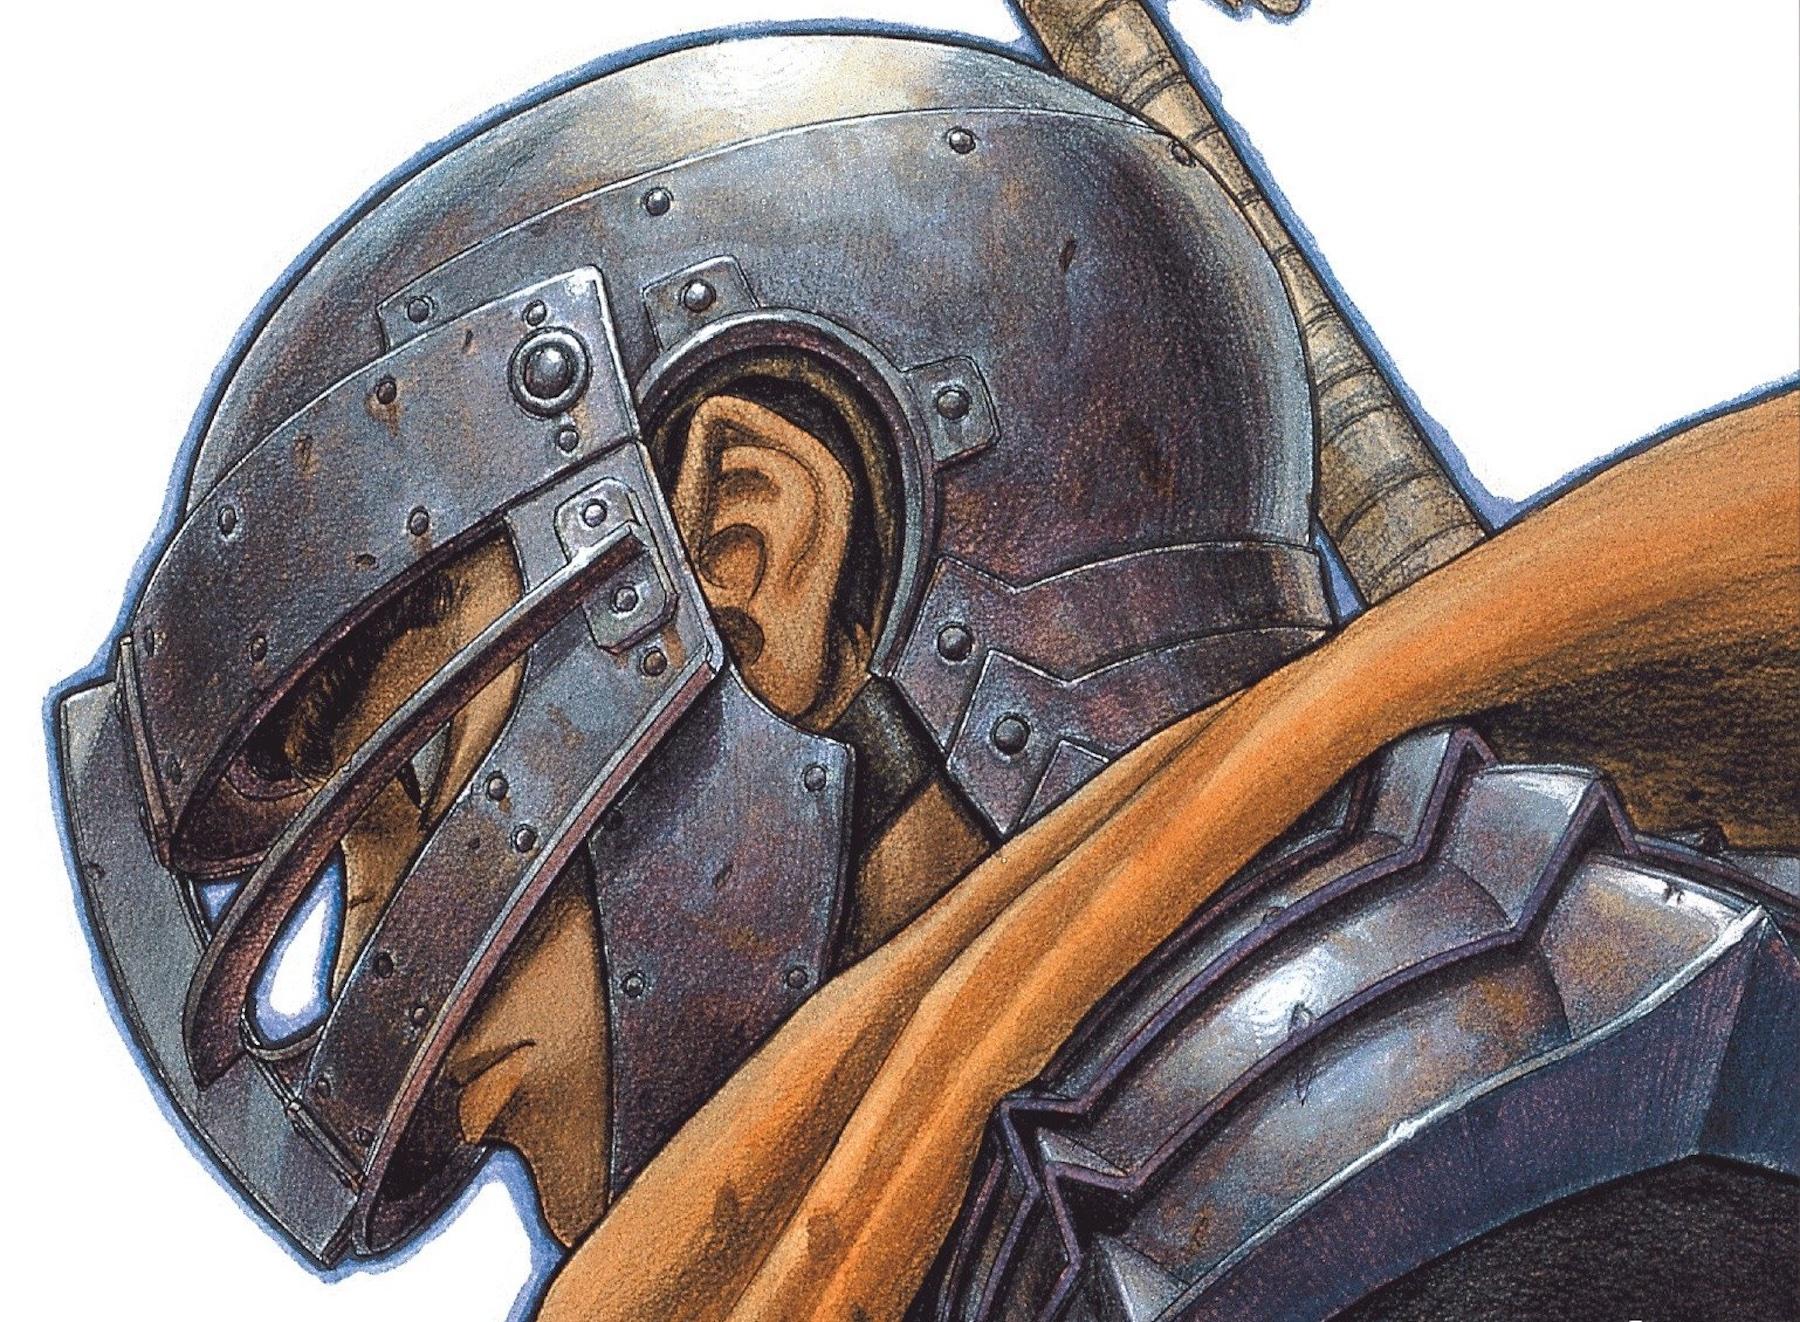 Guts wearing a helmet from the cover of Berserk, Vol. 6 (2005)